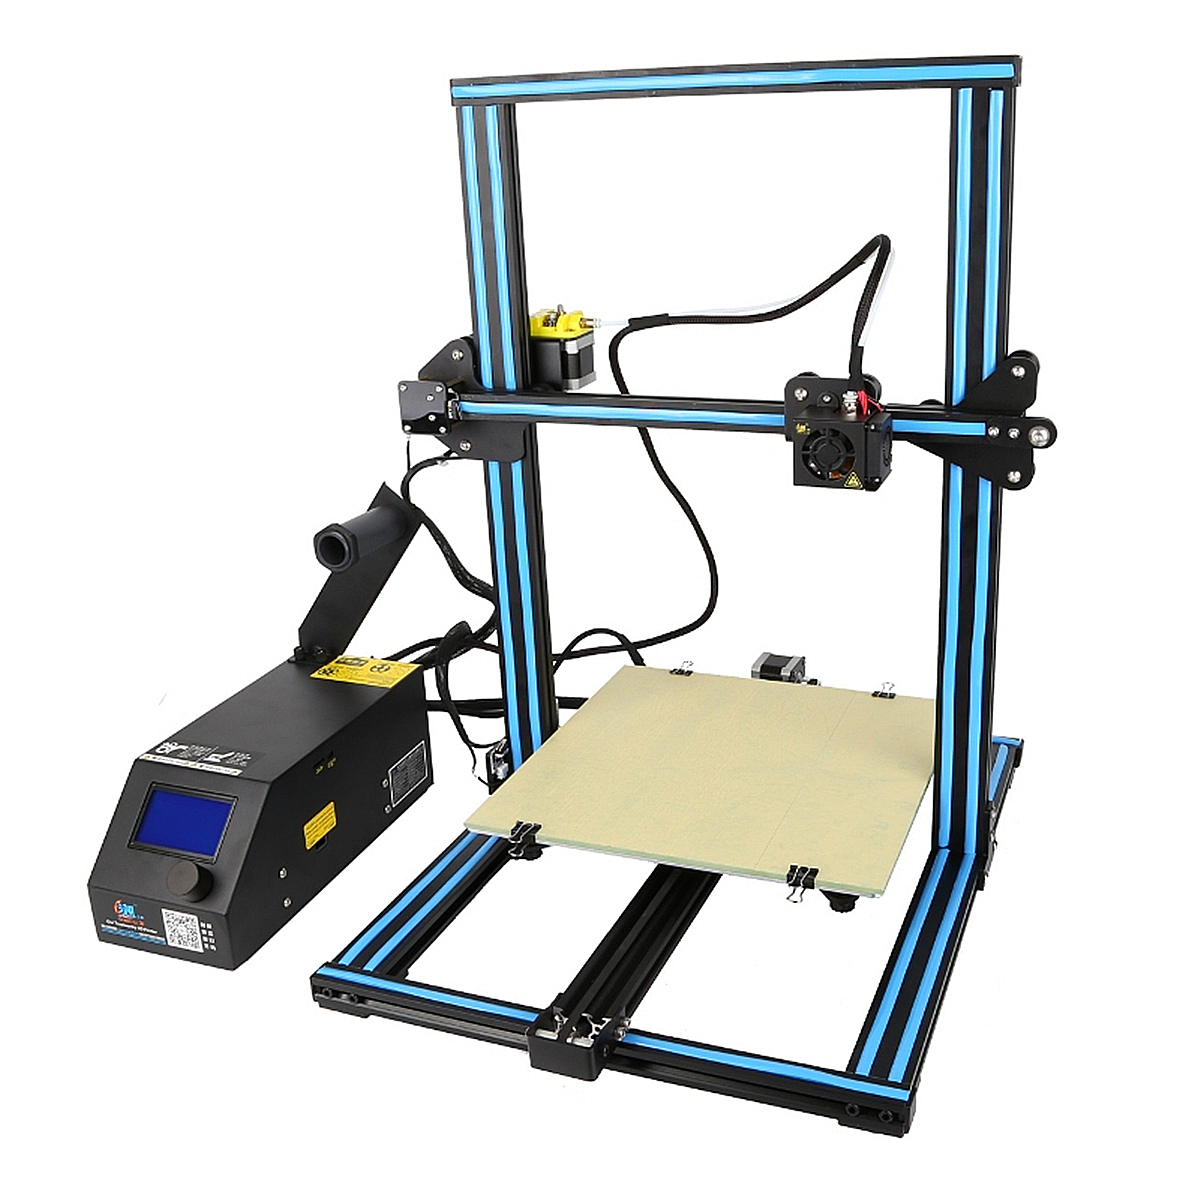 Upgrade CR-10S 3D Printer DIY Kit Large Printing Size Z-axis 1.75mm Filament Diameter EU Plug Optional Creality 3D Printer creality 3d cr 10s diy 3d printer kit large printing size 300 300 400mm dual z rod resume printing filament detect function